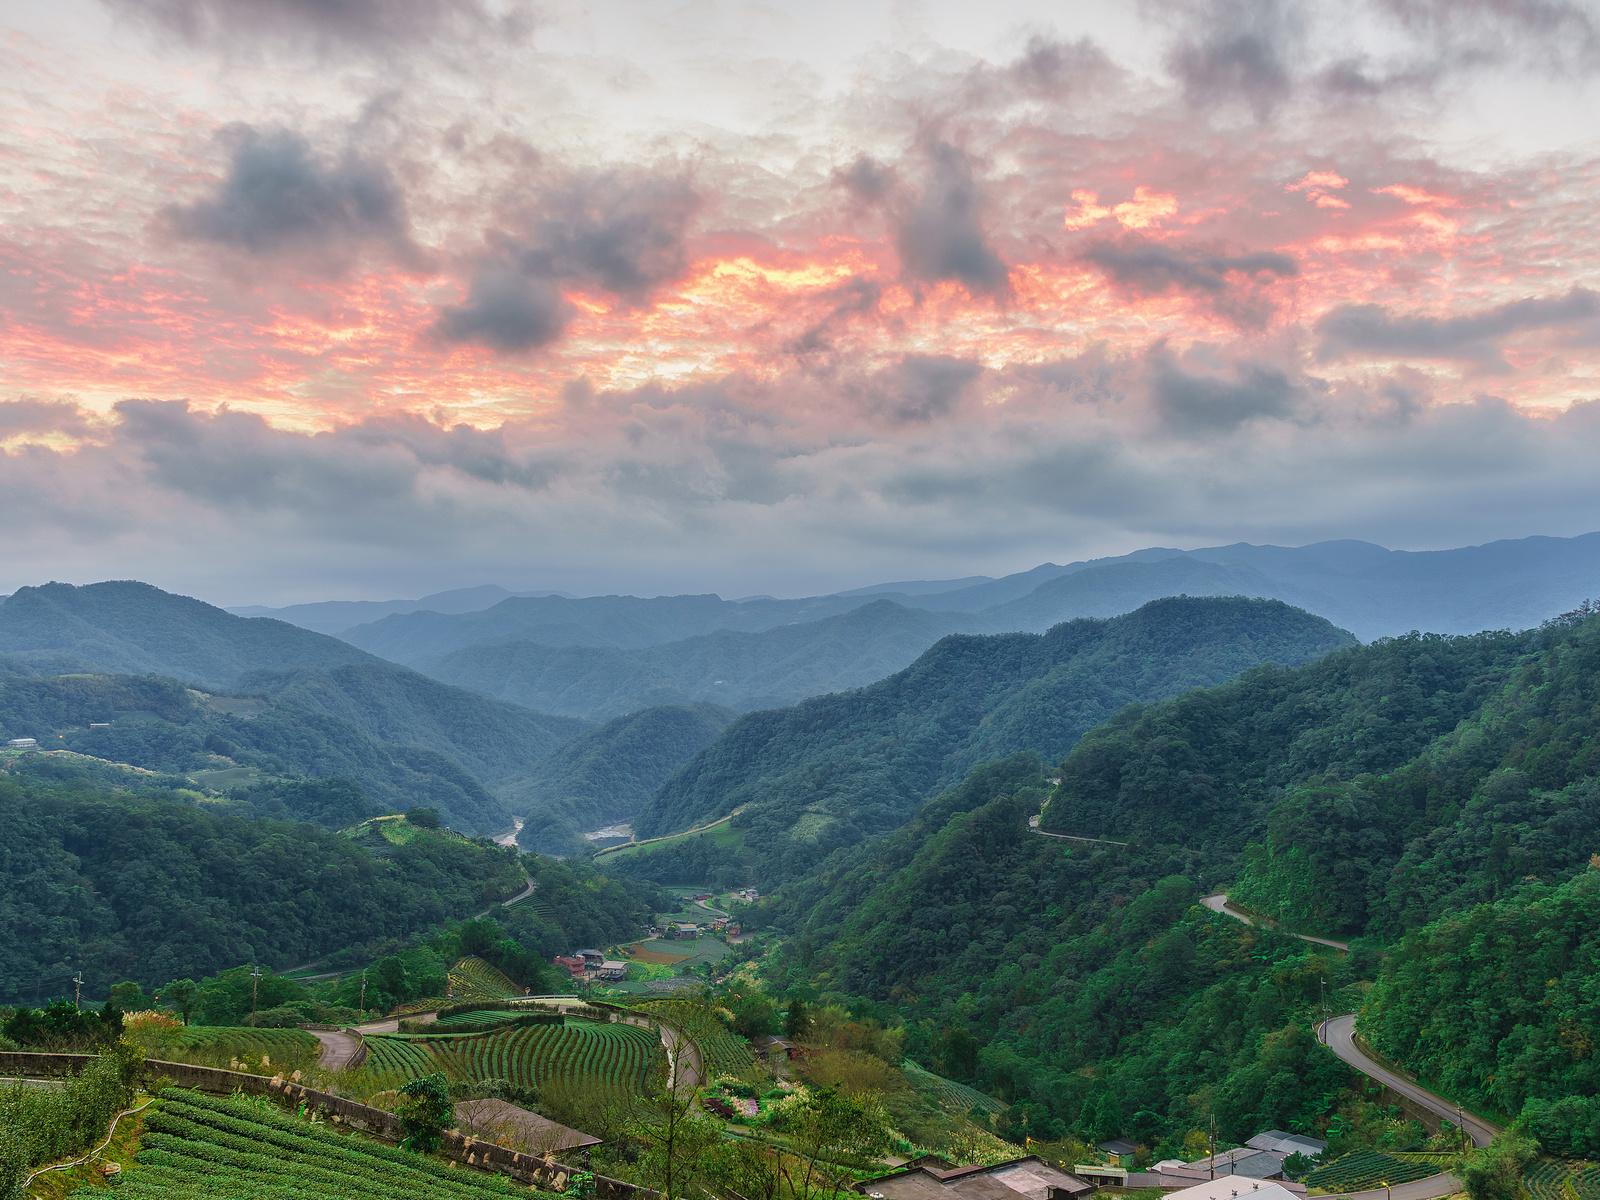 тайвань, пейзаж, горы, небо, поля, лес, taipei, природа